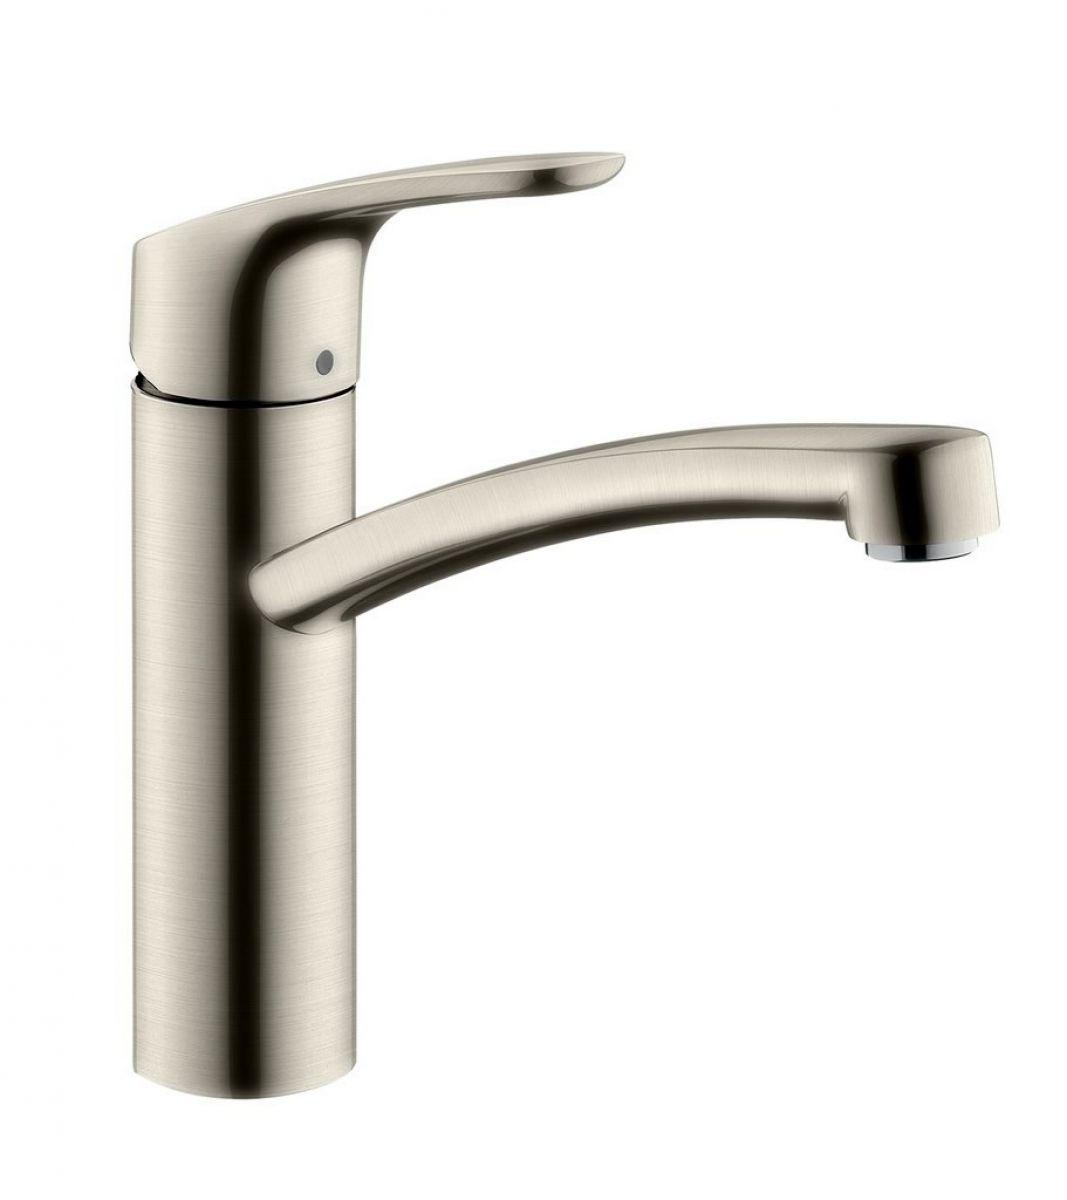 Hansgrohe Kitchen Taps >> Hansgrohe Focus 160 Kitchen Mixer Tap : UK Bathrooms